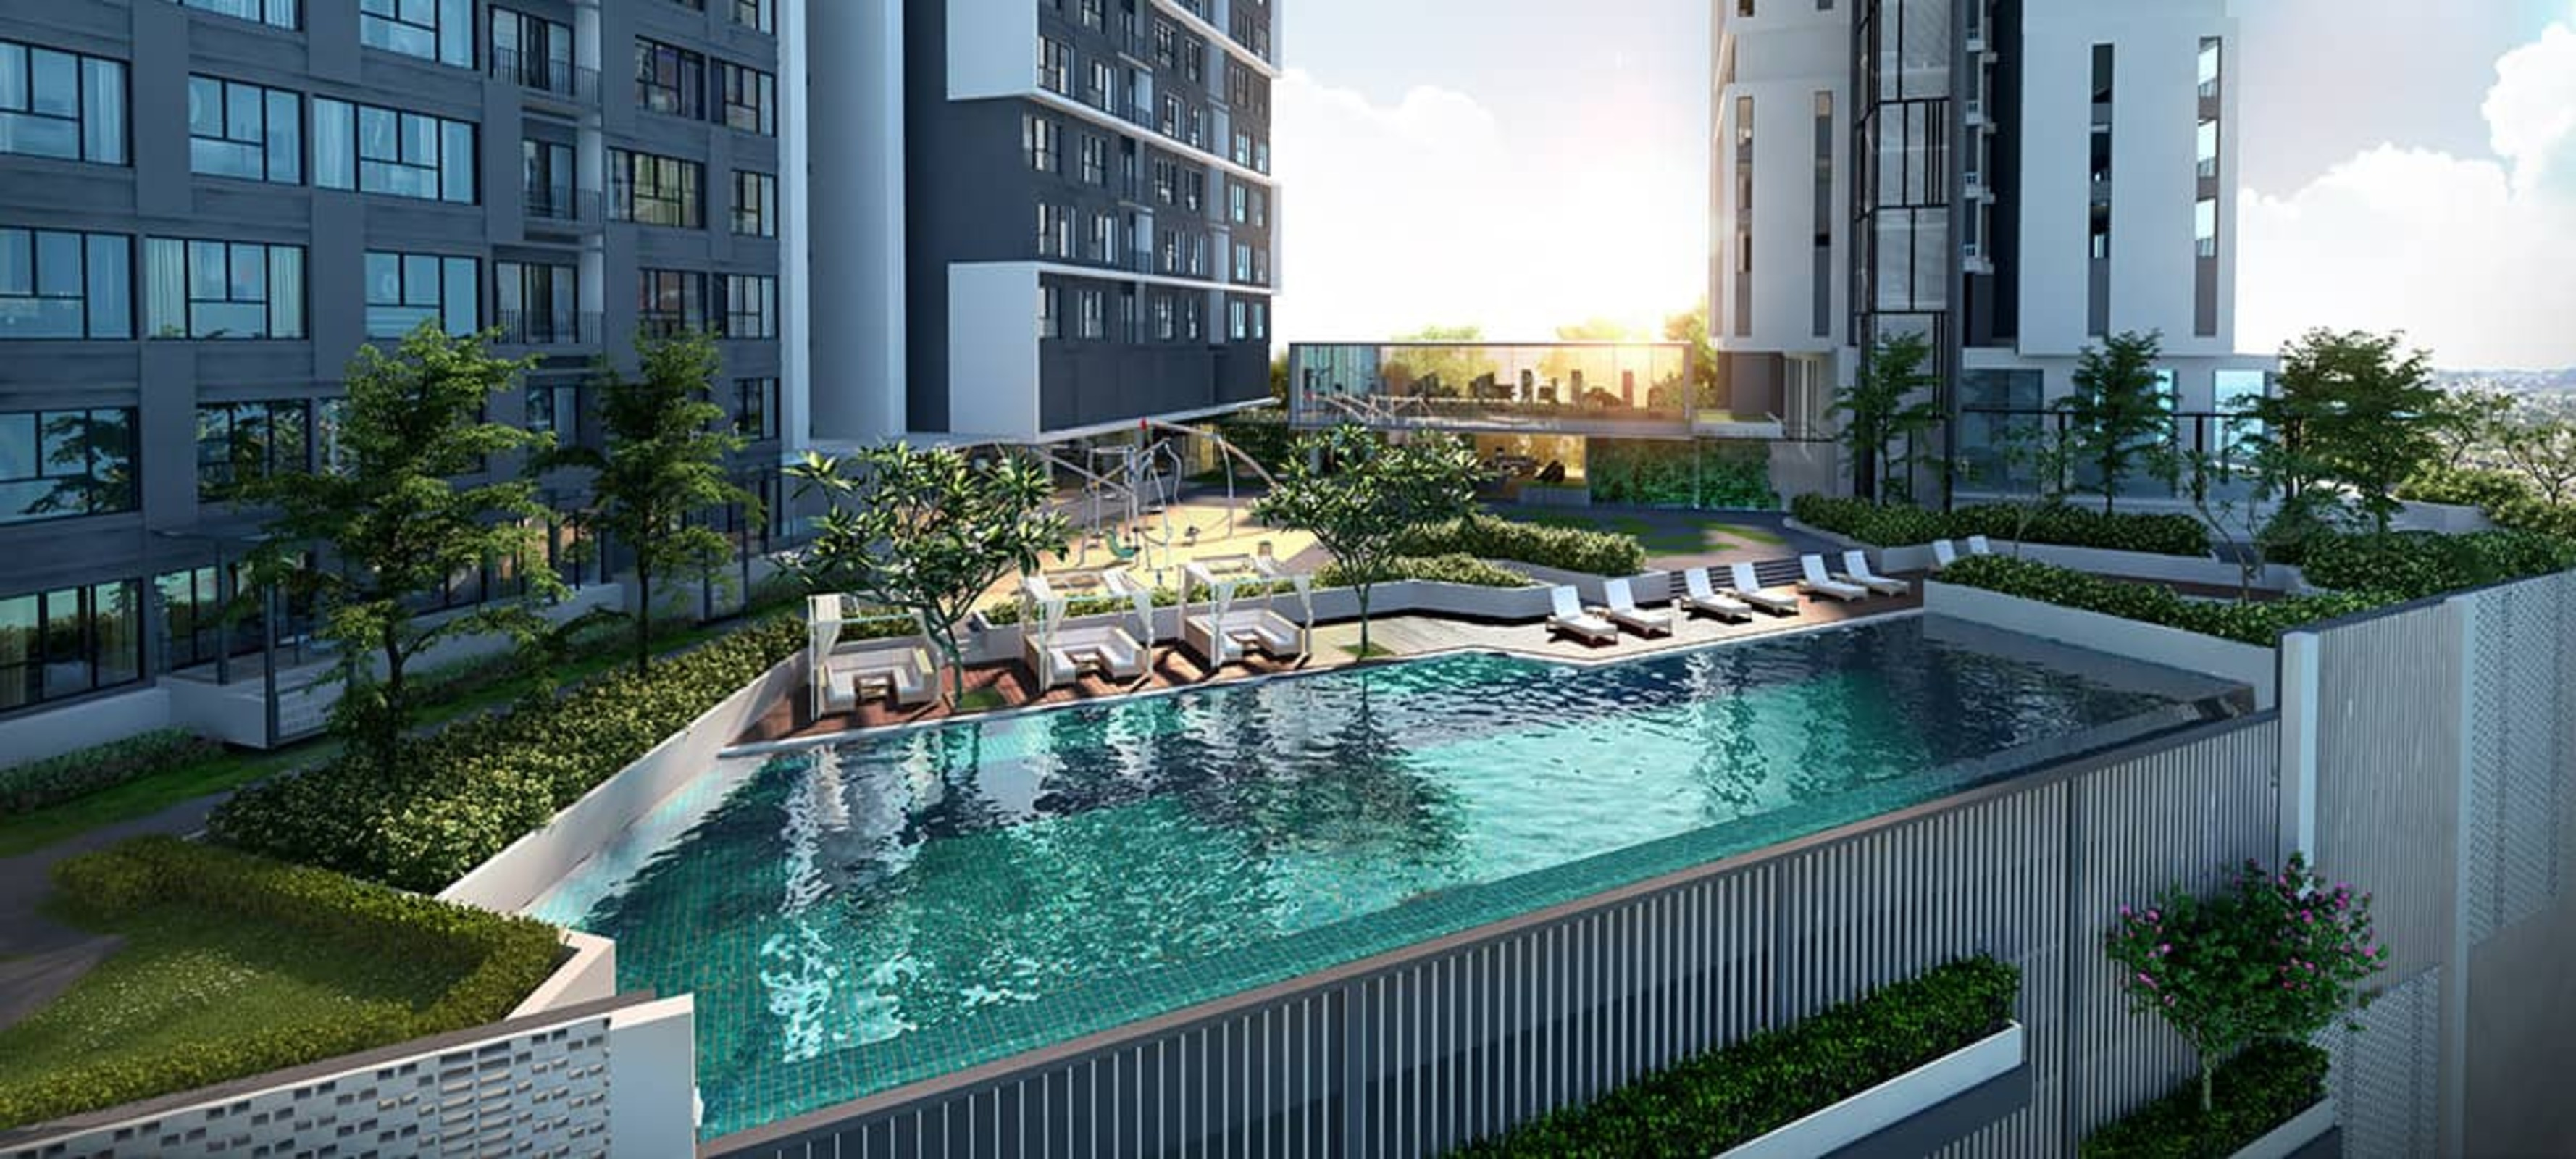 Bandar sri damansara house for sale ativo suites 14